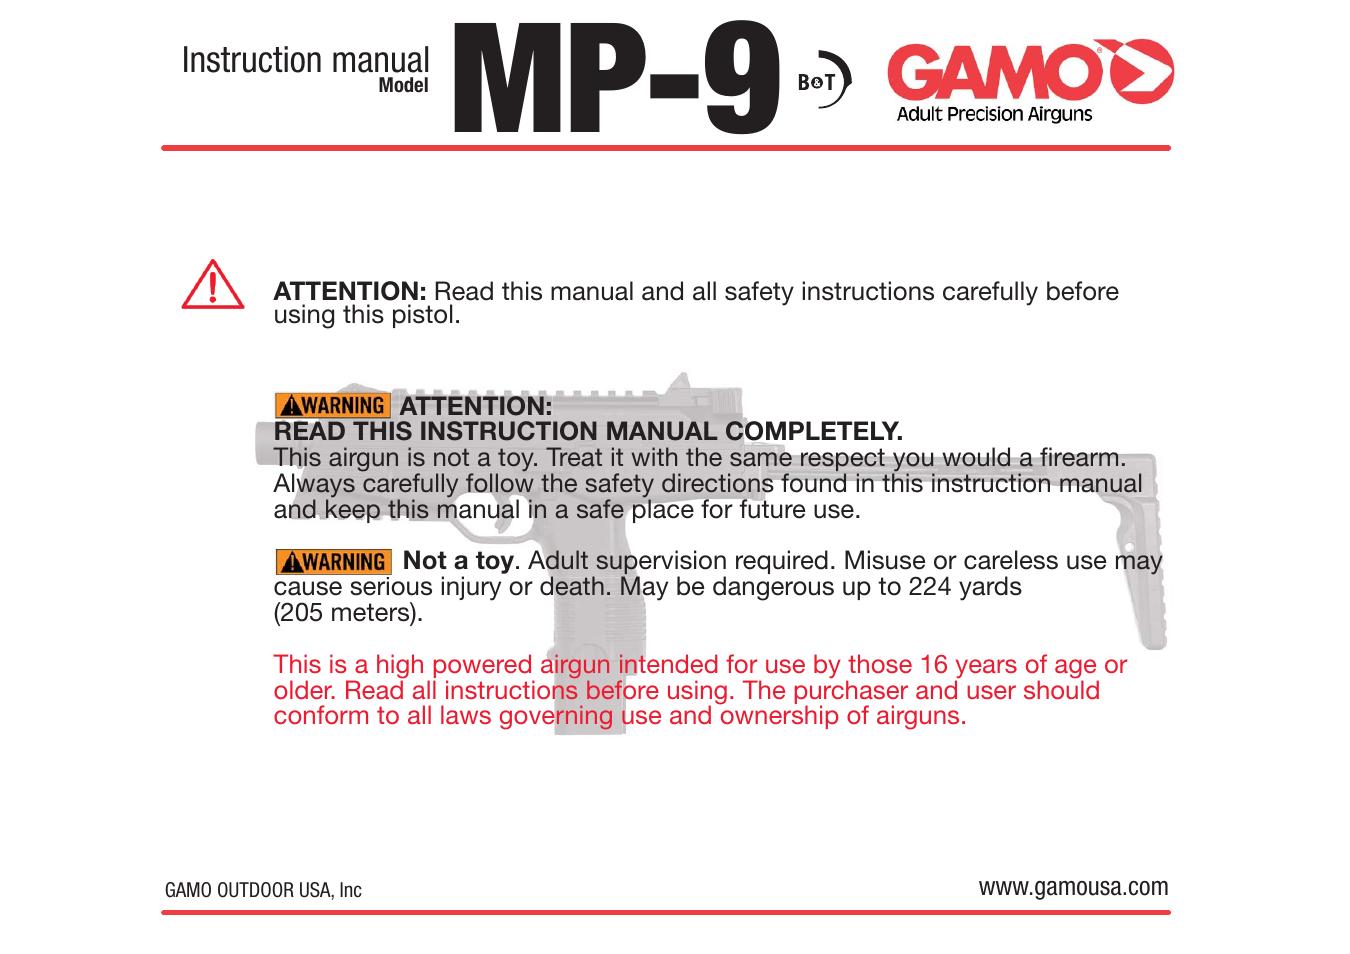 gamo mp9 blowback pistol user manual 7 pages rh manualsdir com vport user manual read well vport user manual read well